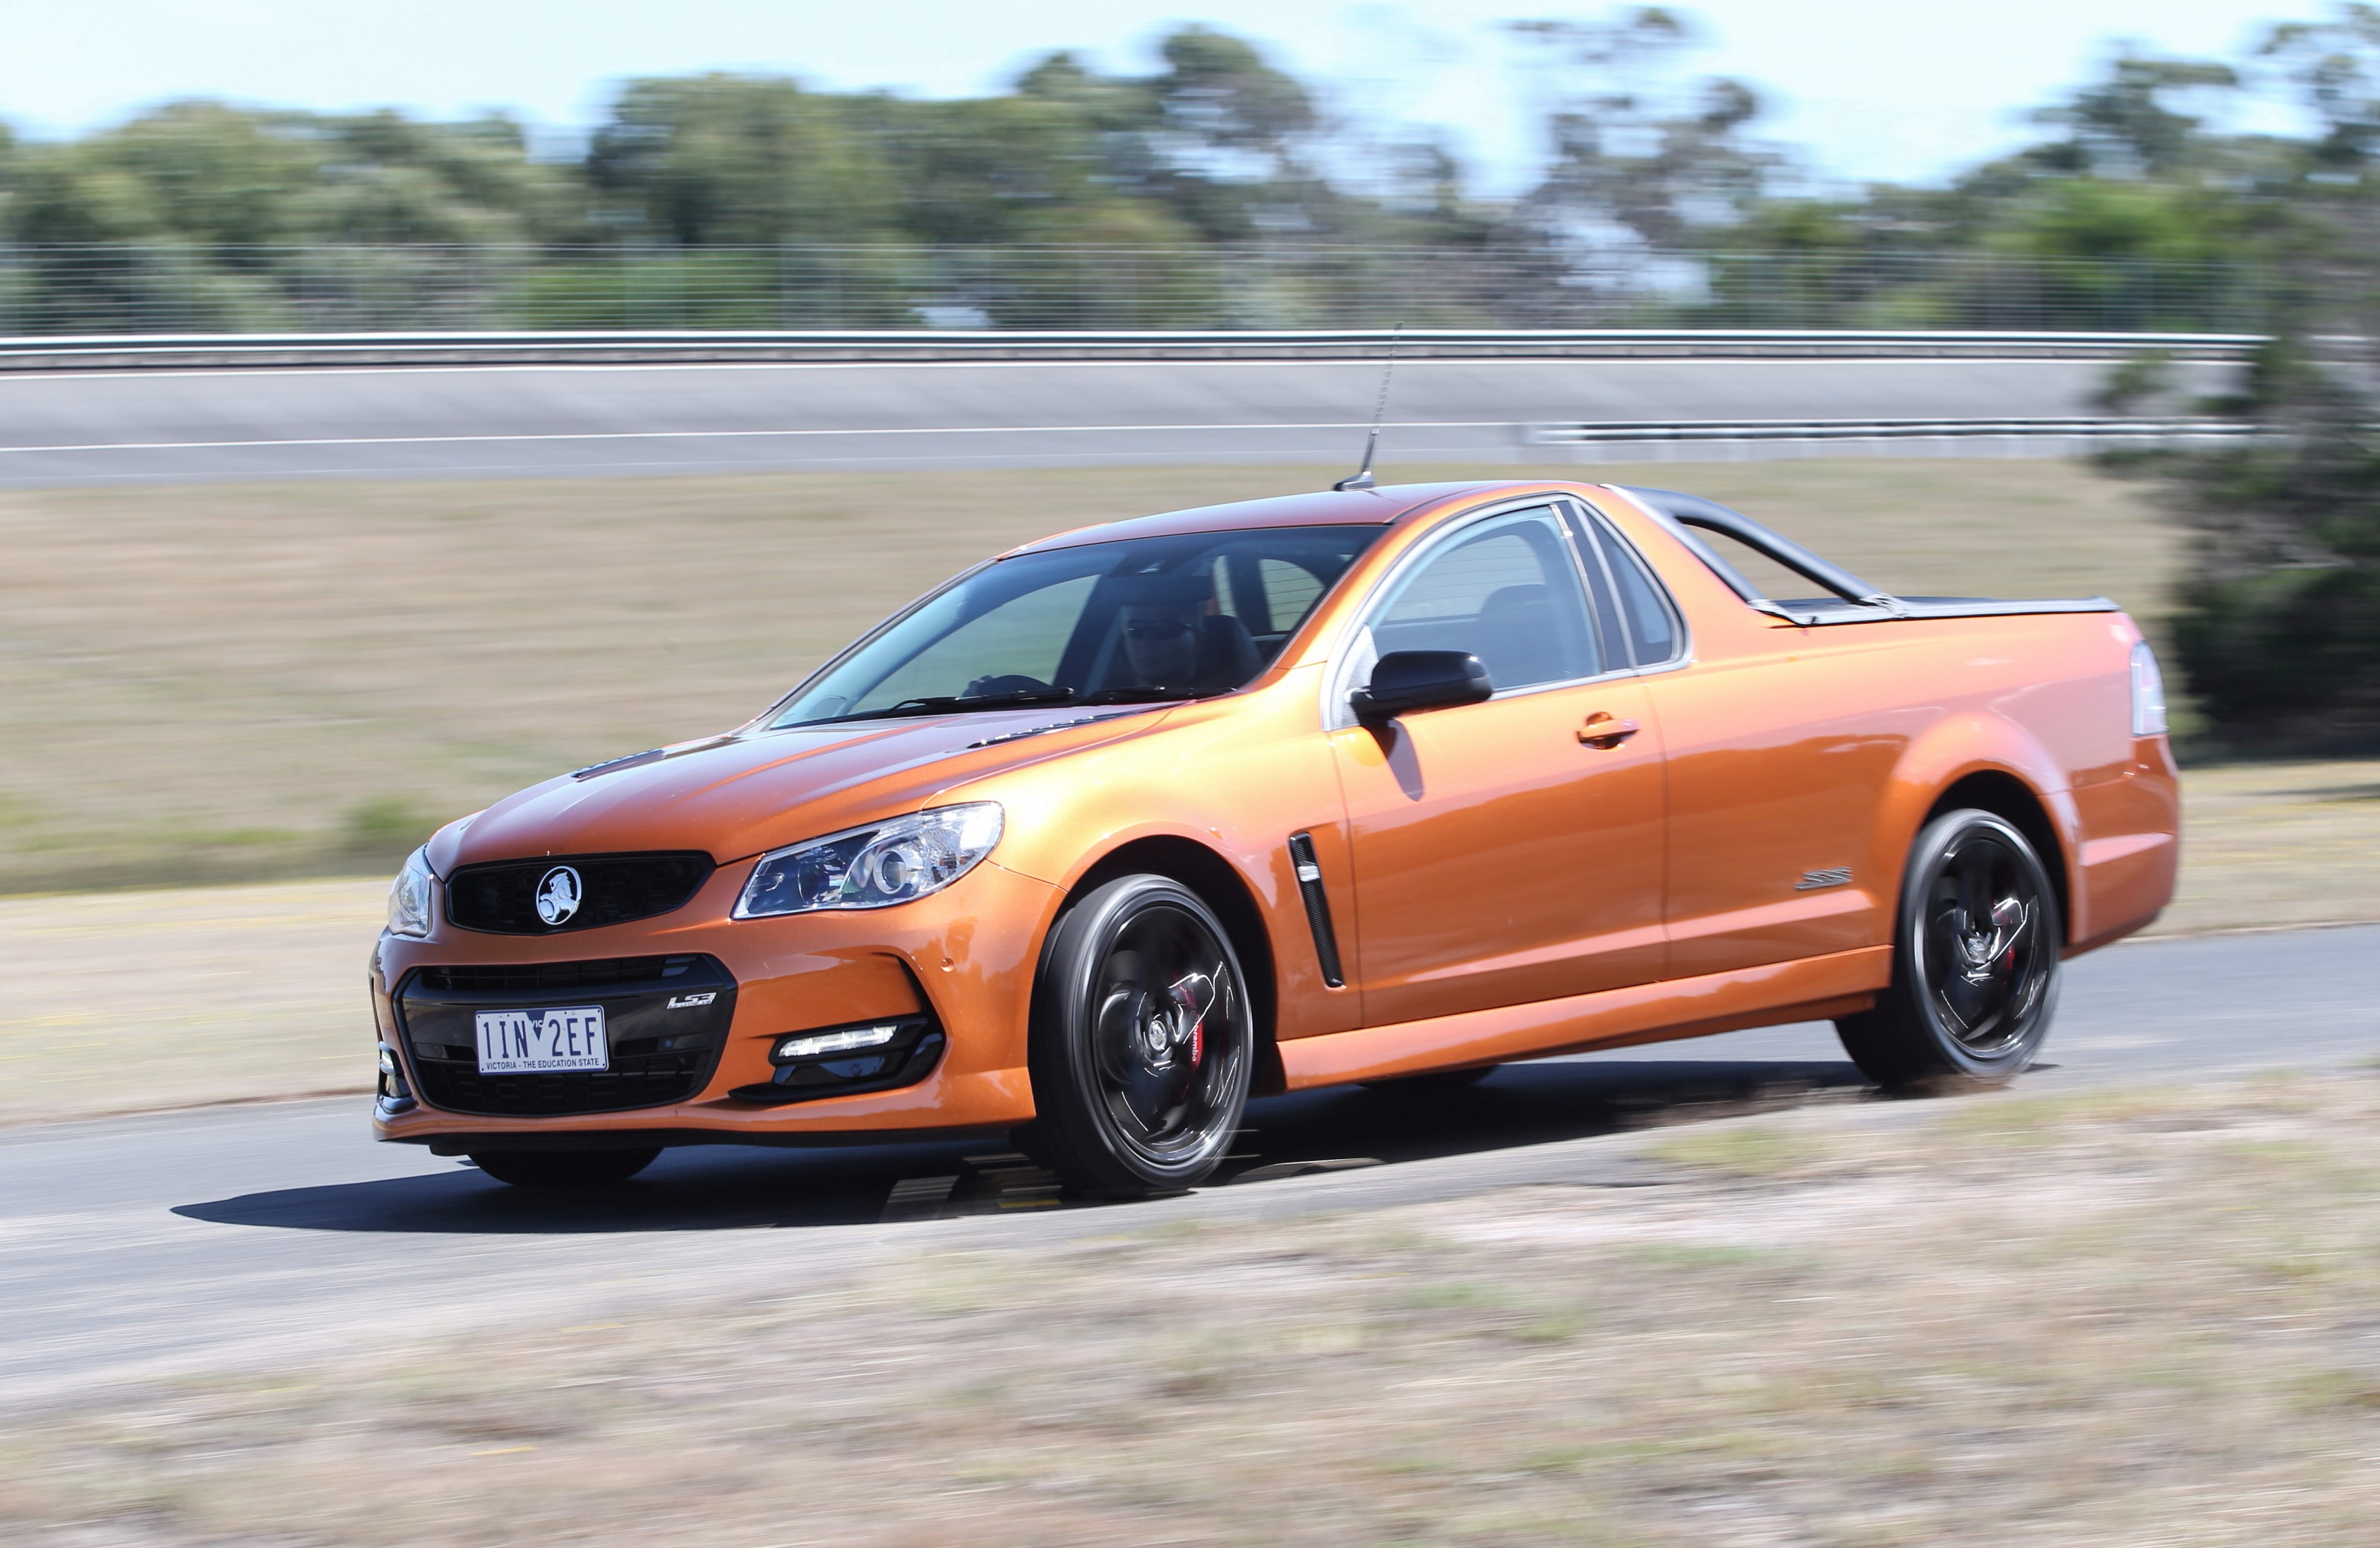 2017 Holden Commodore Is The GM Zeta Platform's Last ...